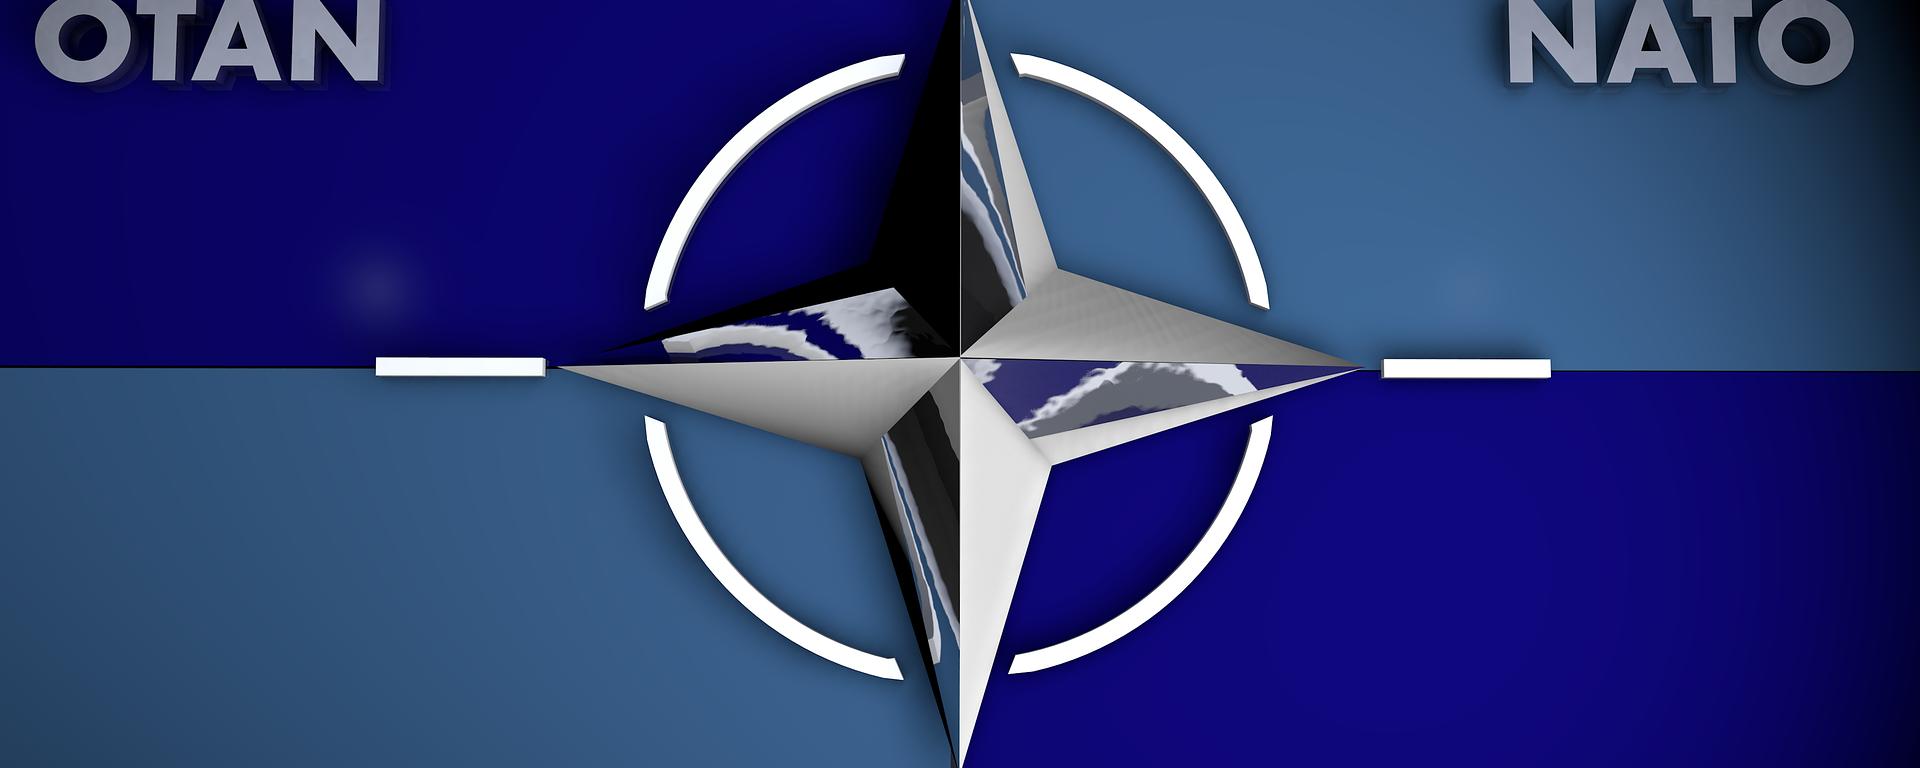 Logo OTAN - Sputnik Mundo, 1920, 24.05.2021